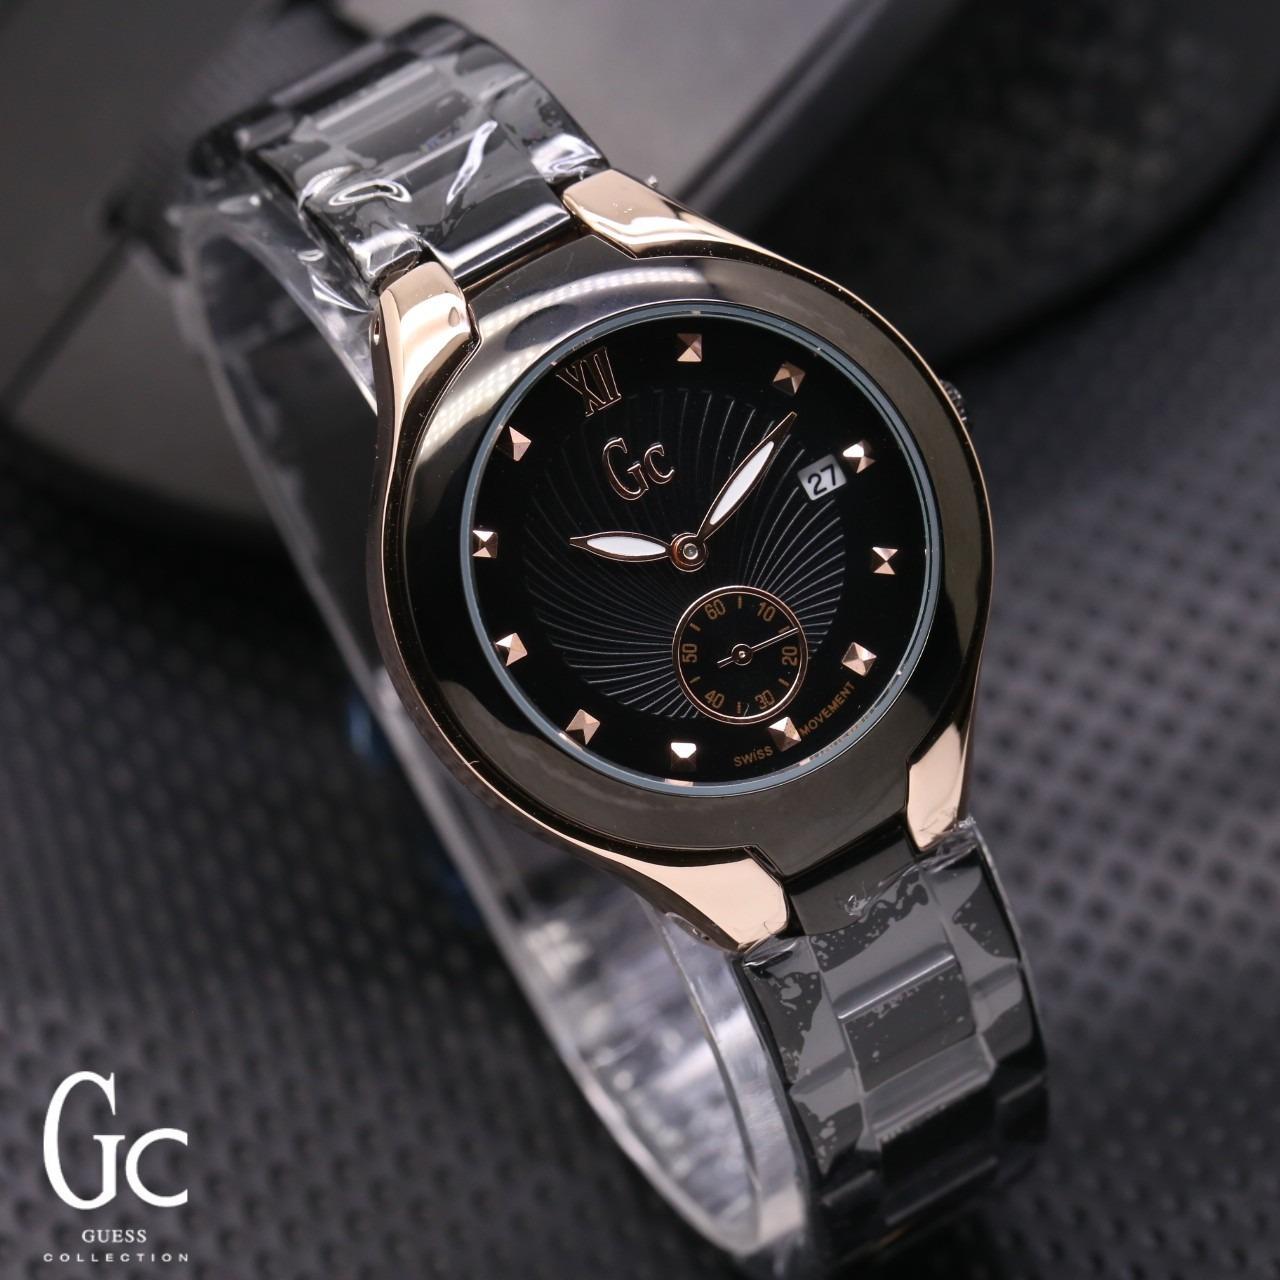 Jam tangan fashion wanita harga grosir - Rantai crono